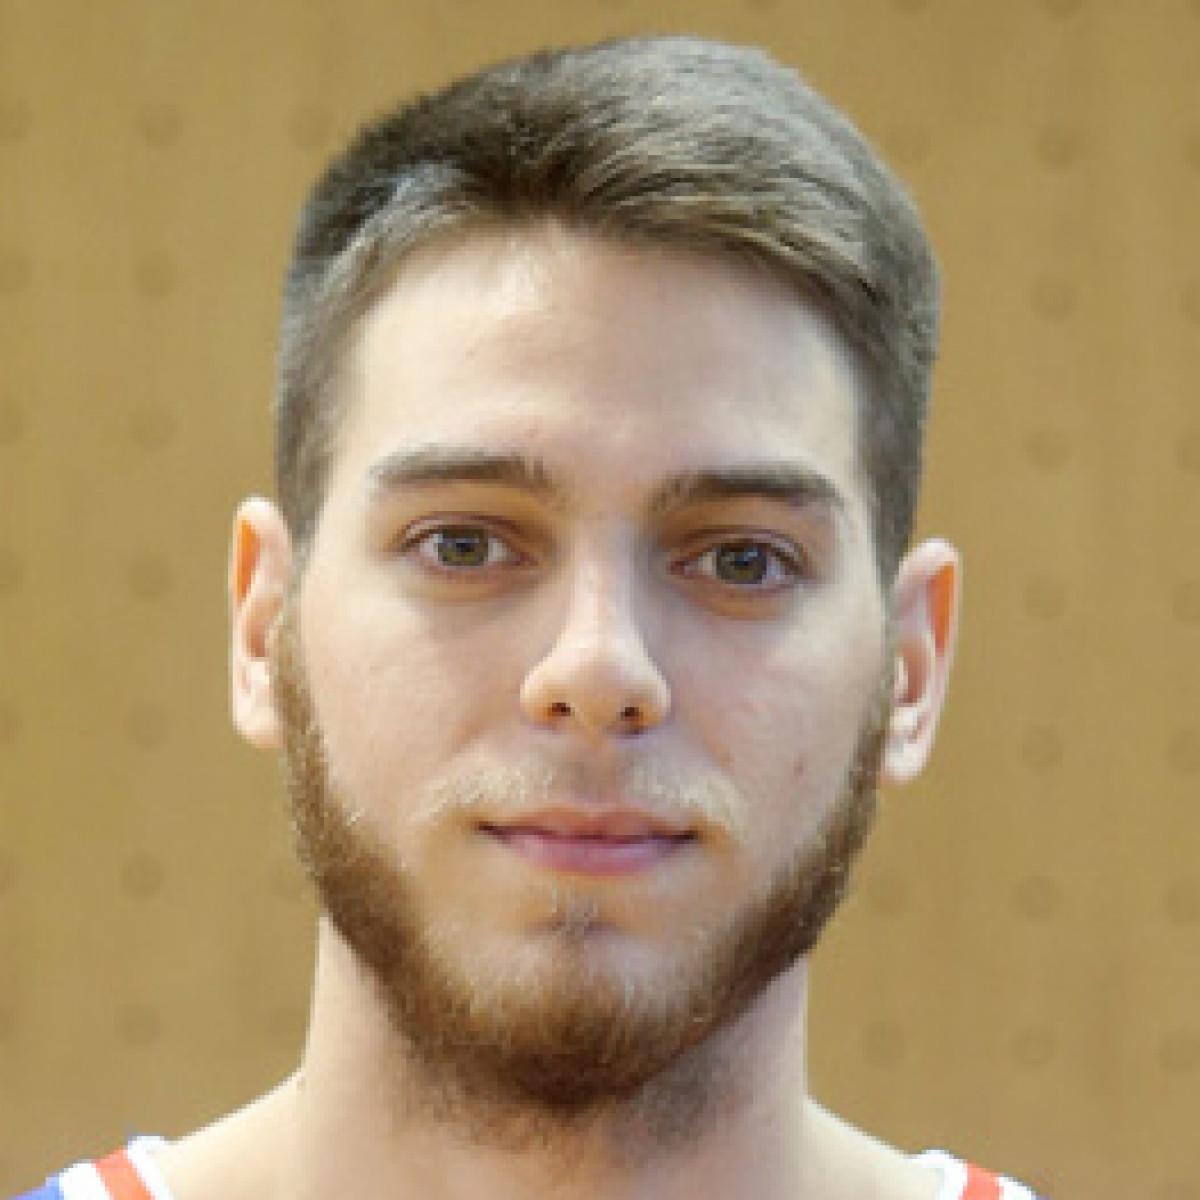 Ioannis Karamalegkos